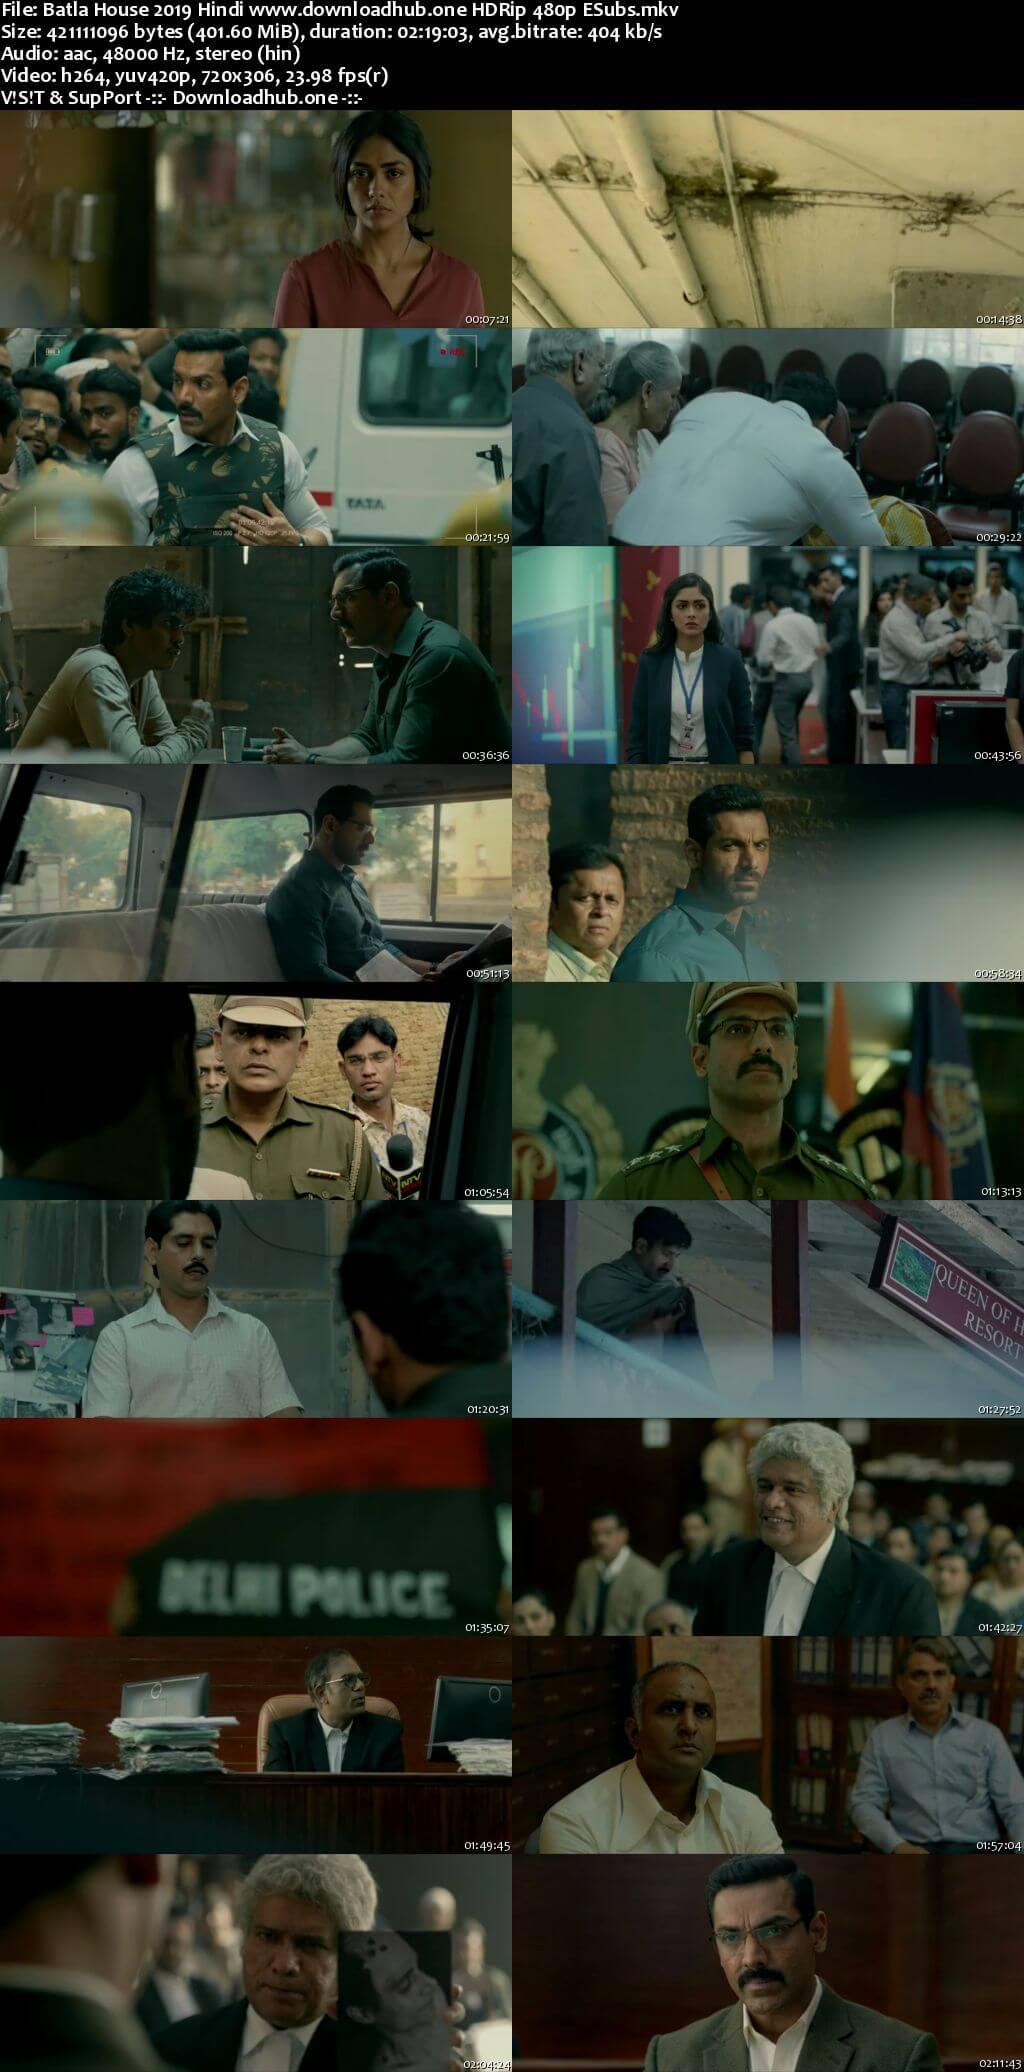 Batla House 2019 Hindi 400MB HDRip 480p ESubs